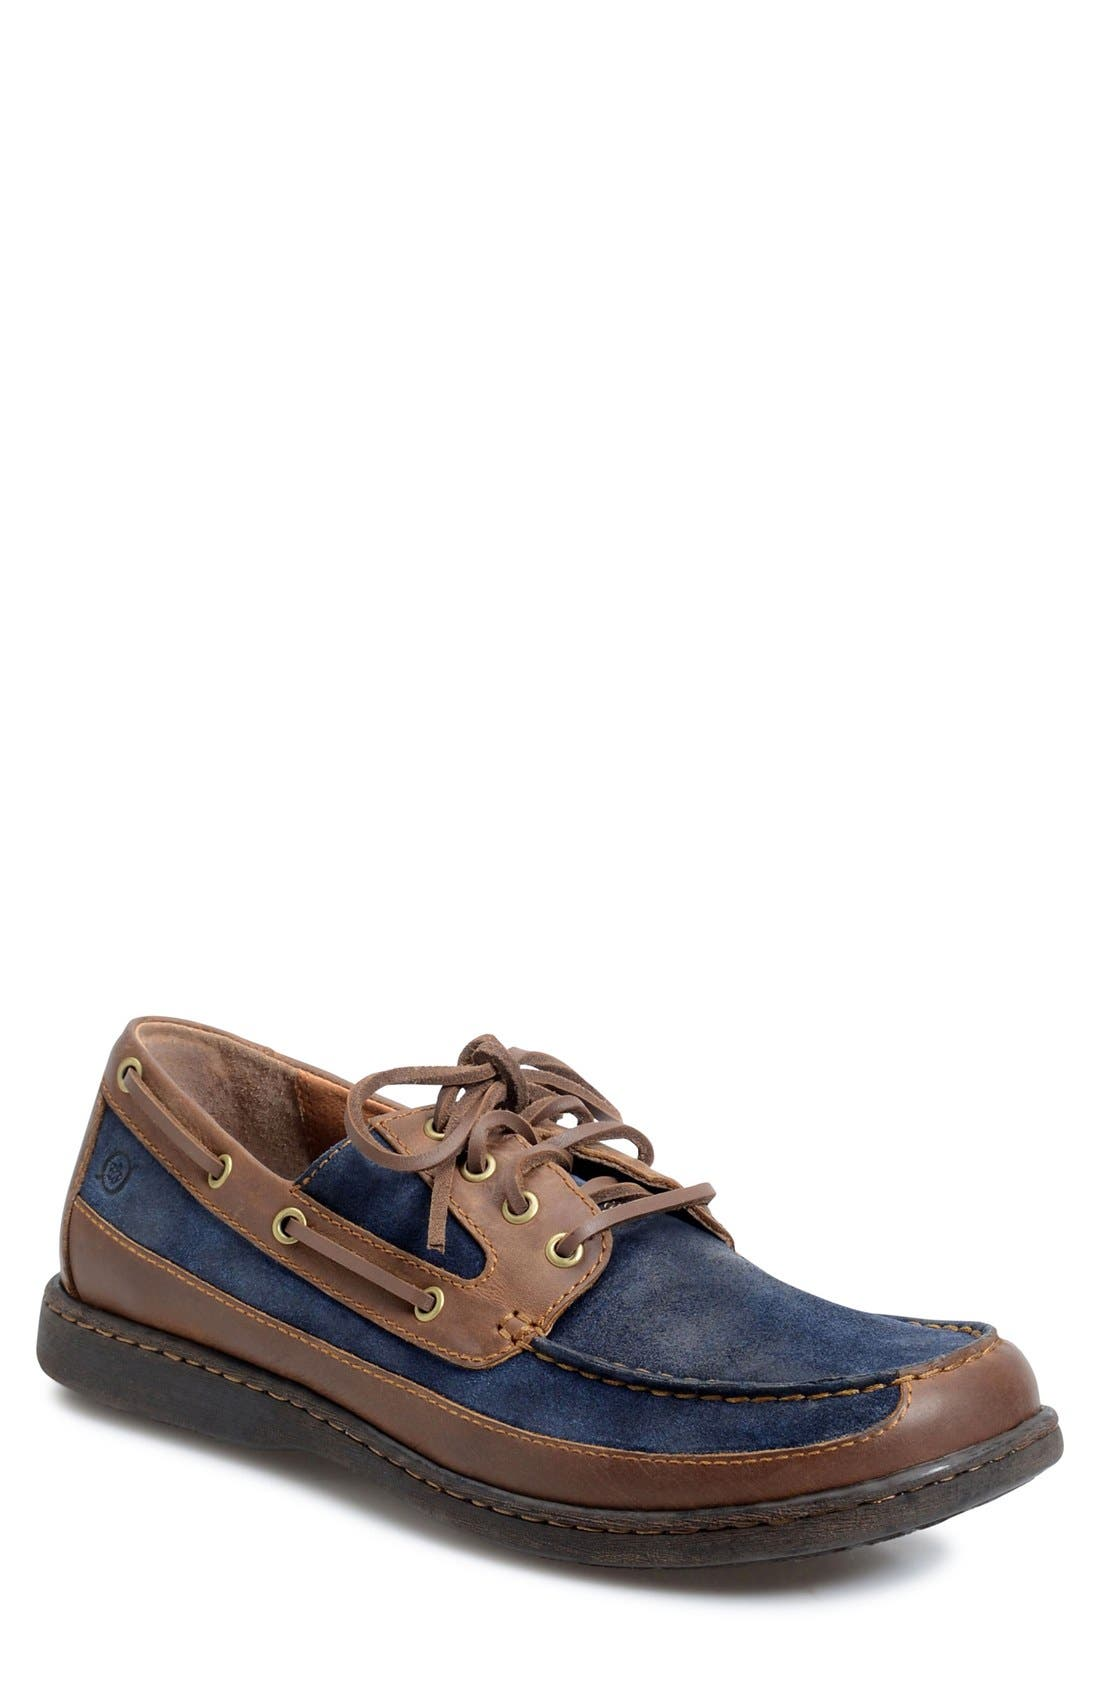 'Harwich' Boat Shoe,                         Main,                         color, Blue